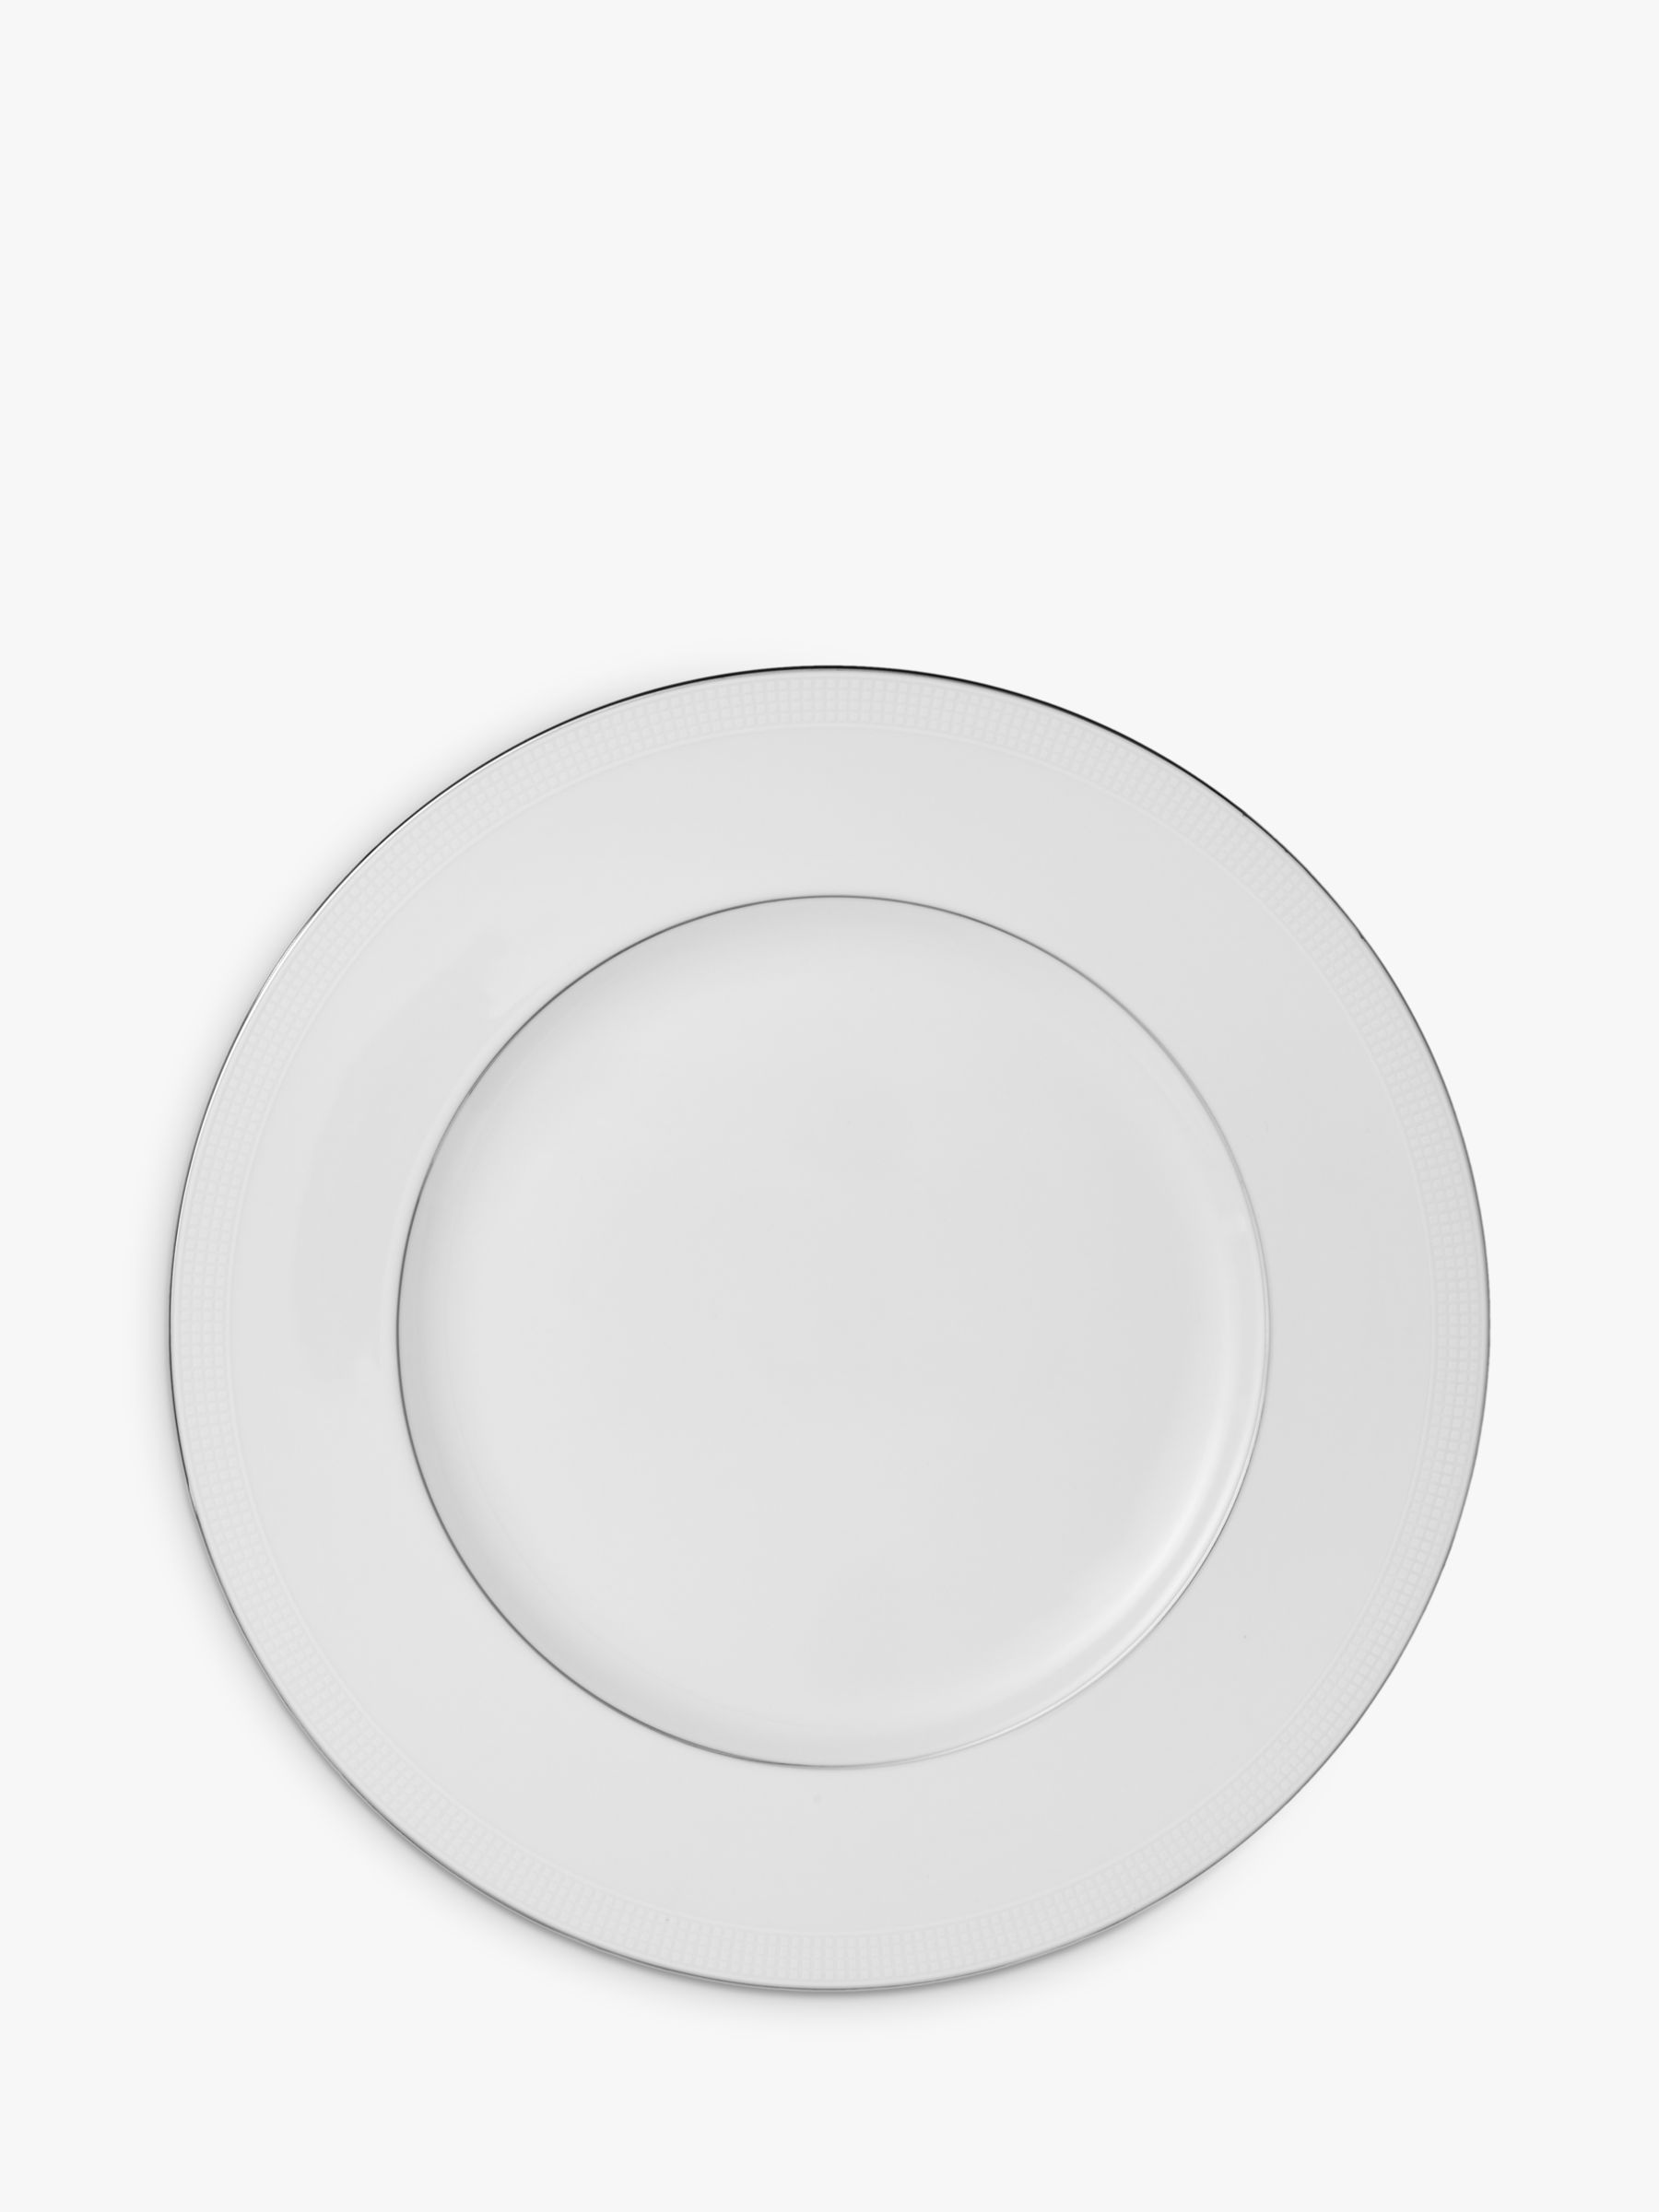 Vera Wang for Wedgwood Vera Wang for Wedgwood Blanc sur Blanc Plate 20cm, White